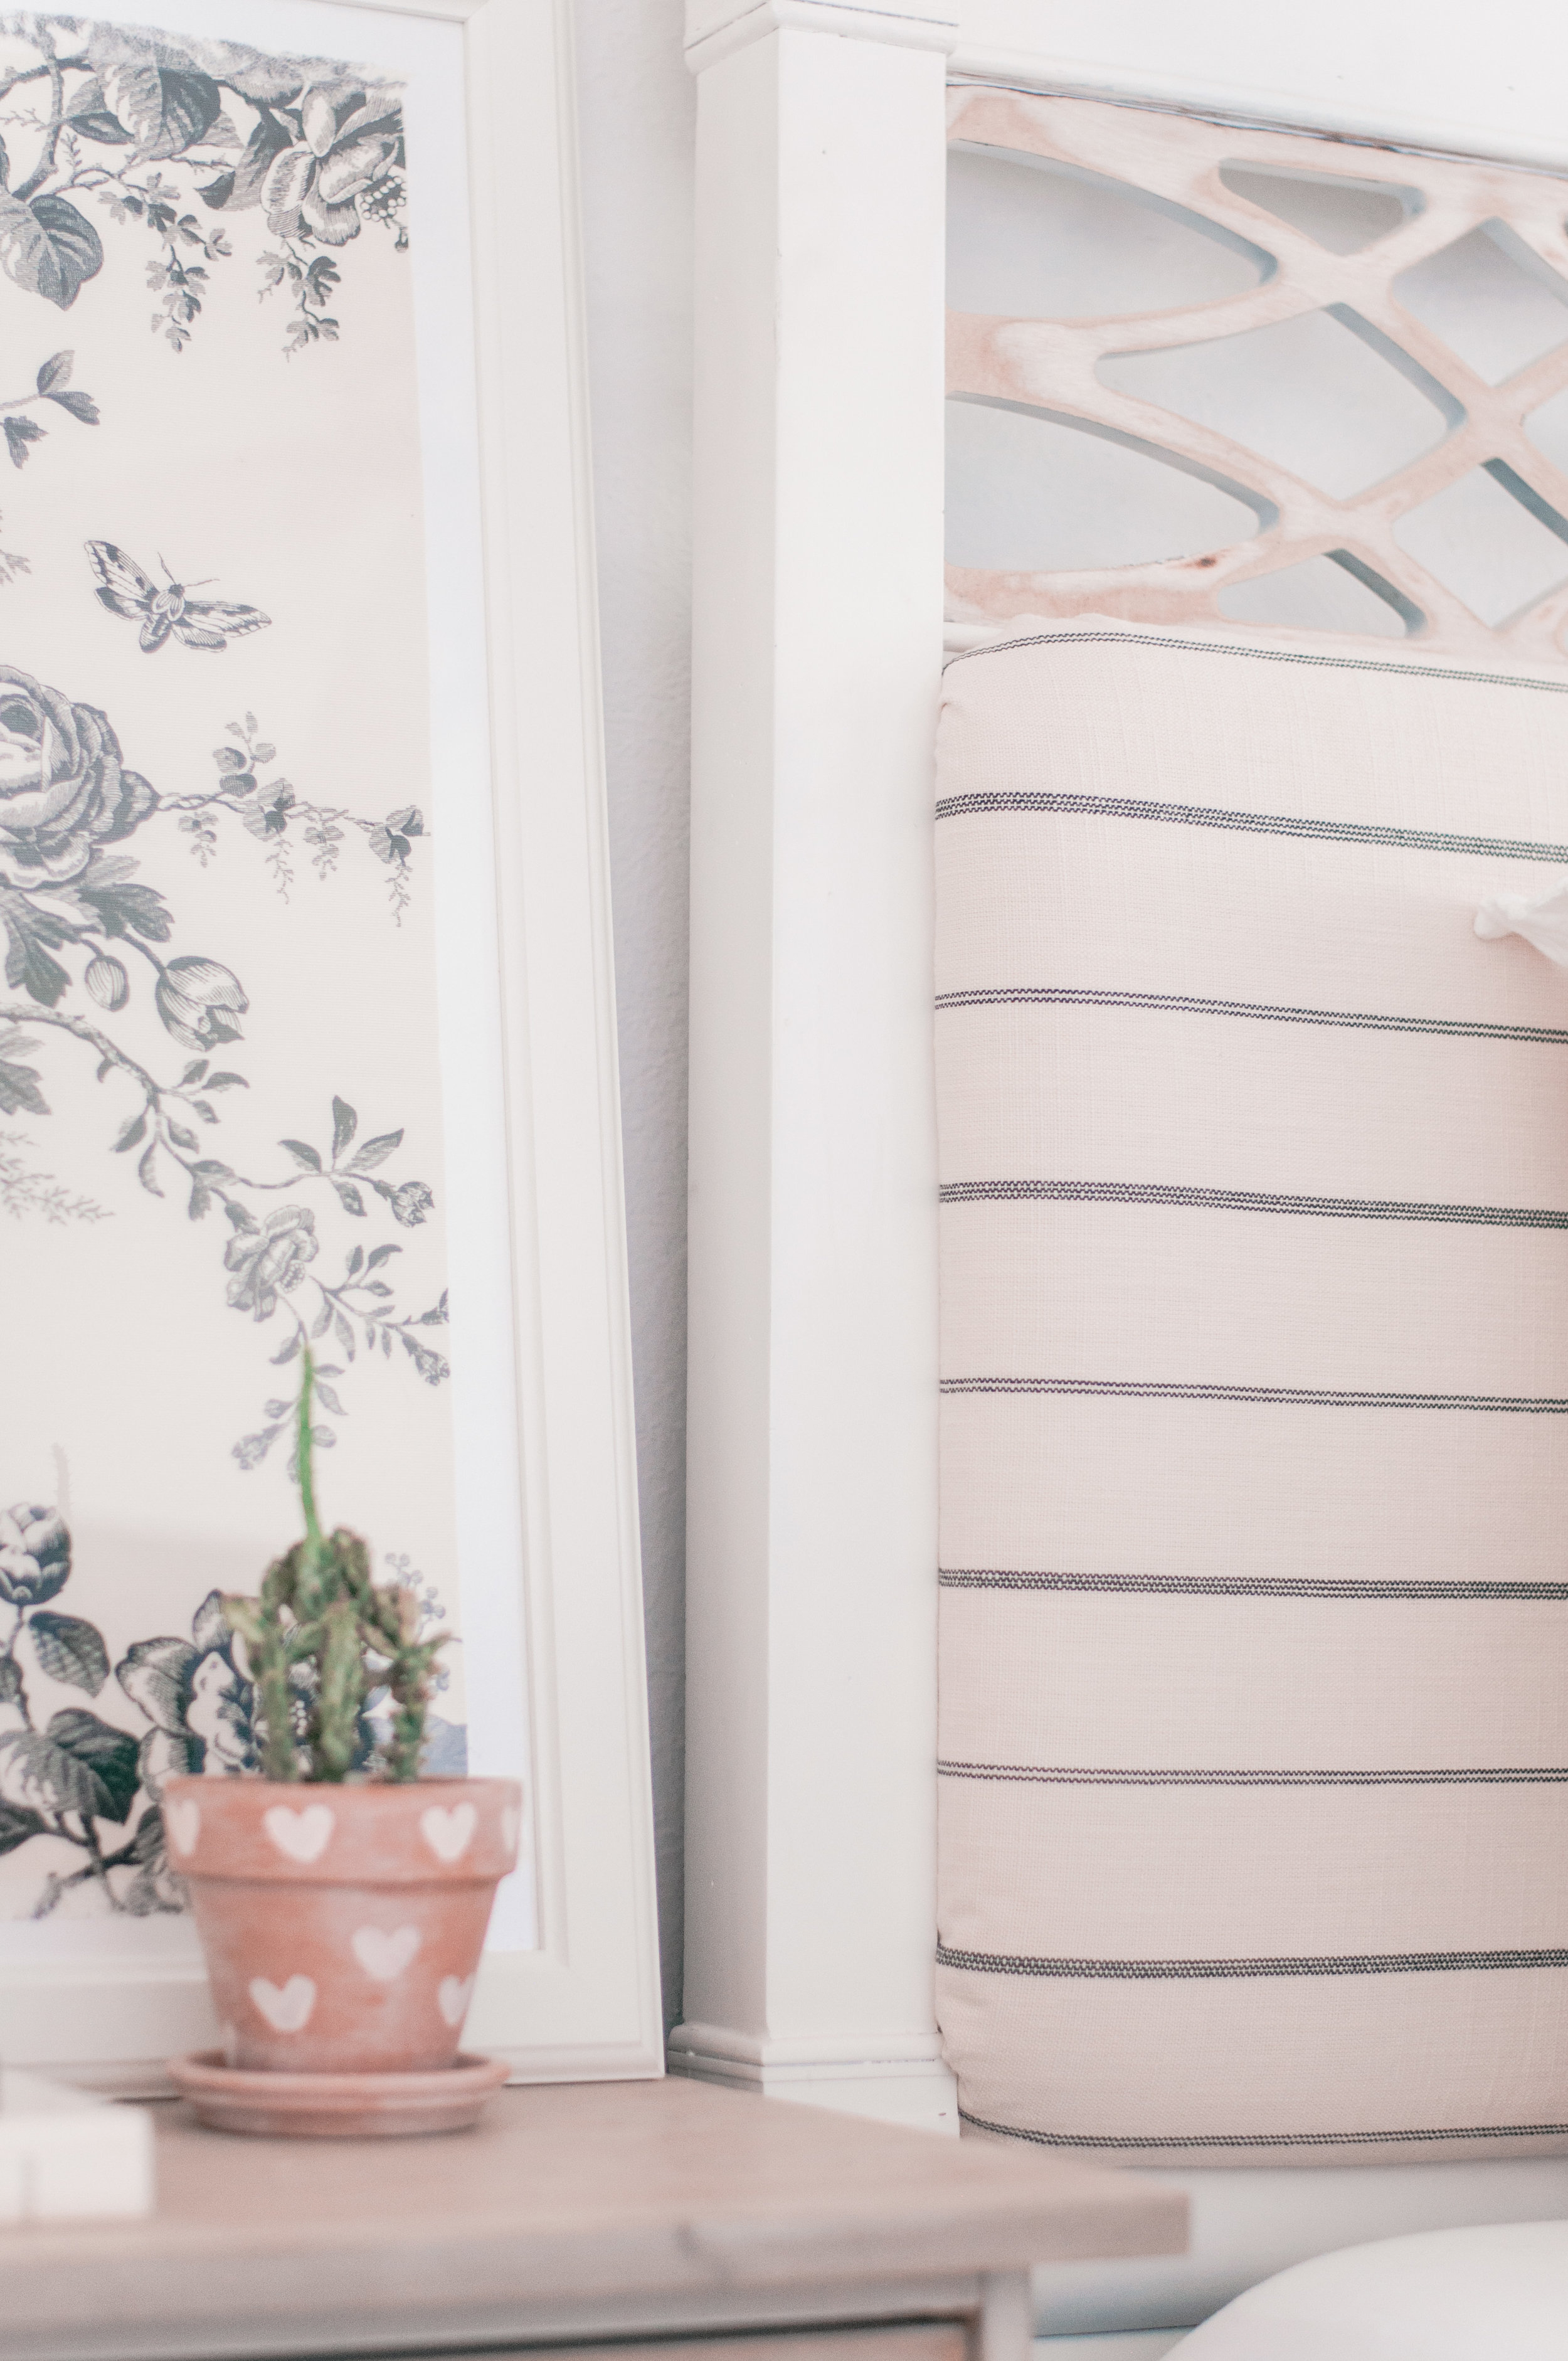 DIY Fabric Headboard Ideas